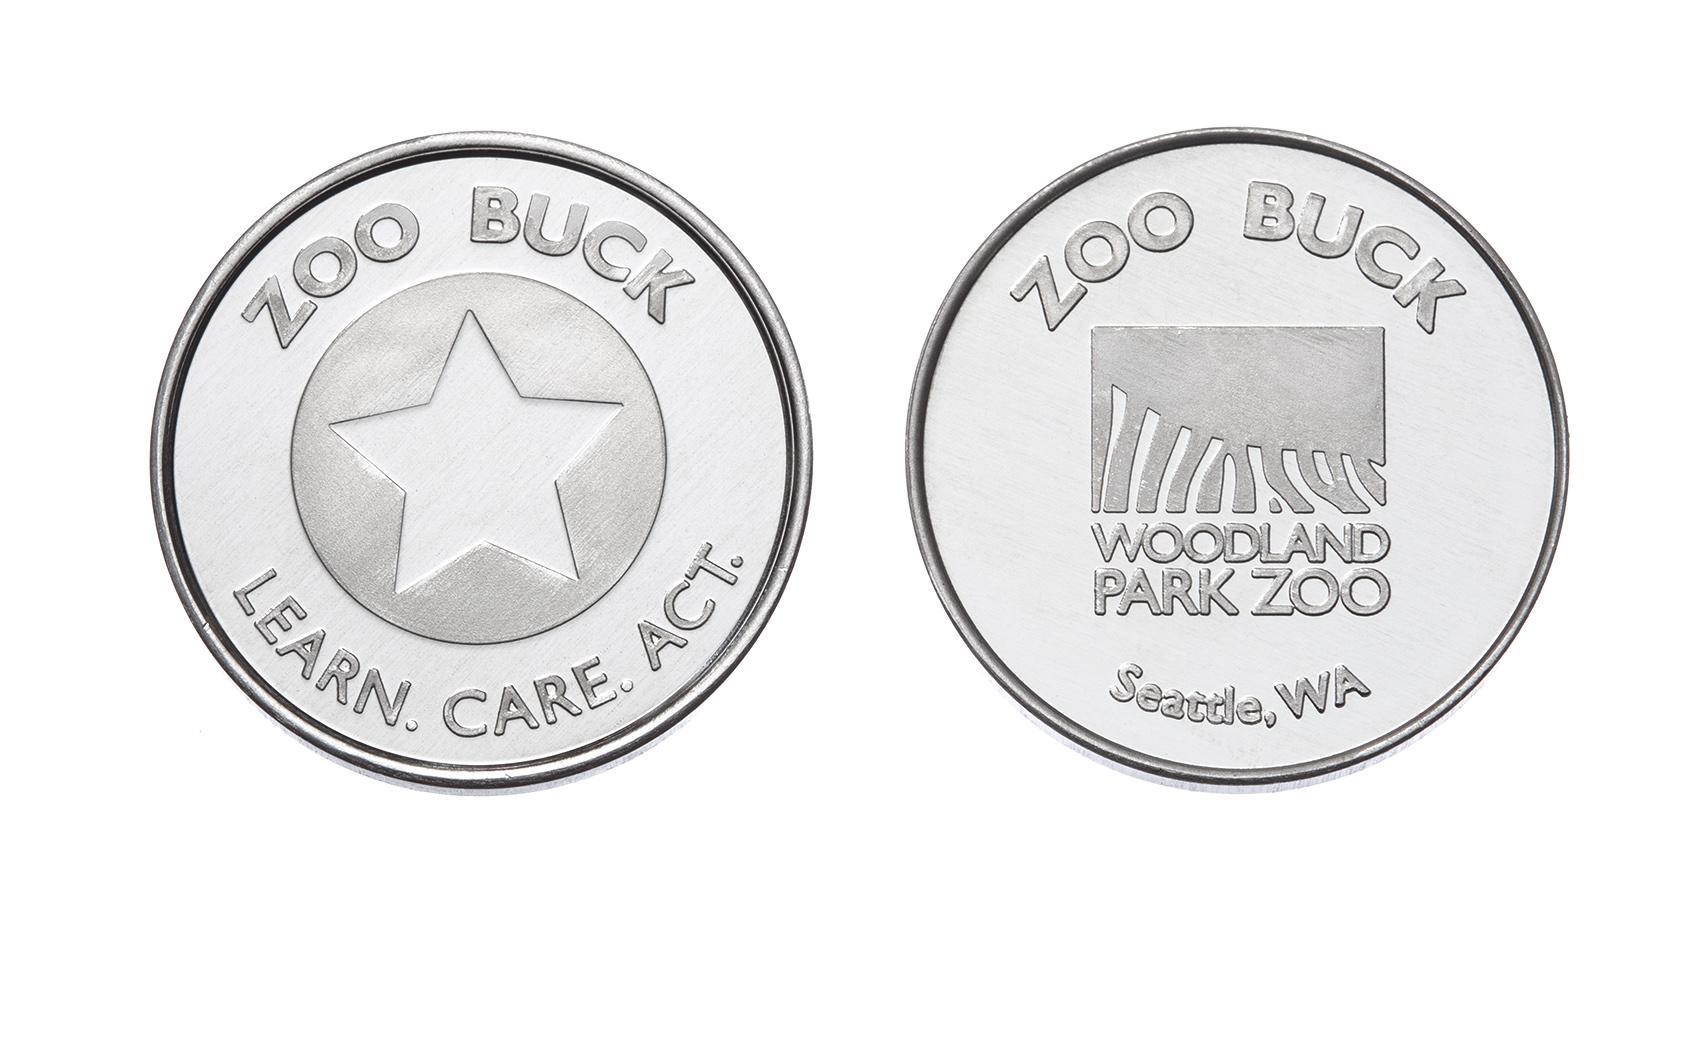 KUDOS custom aluminum tokens